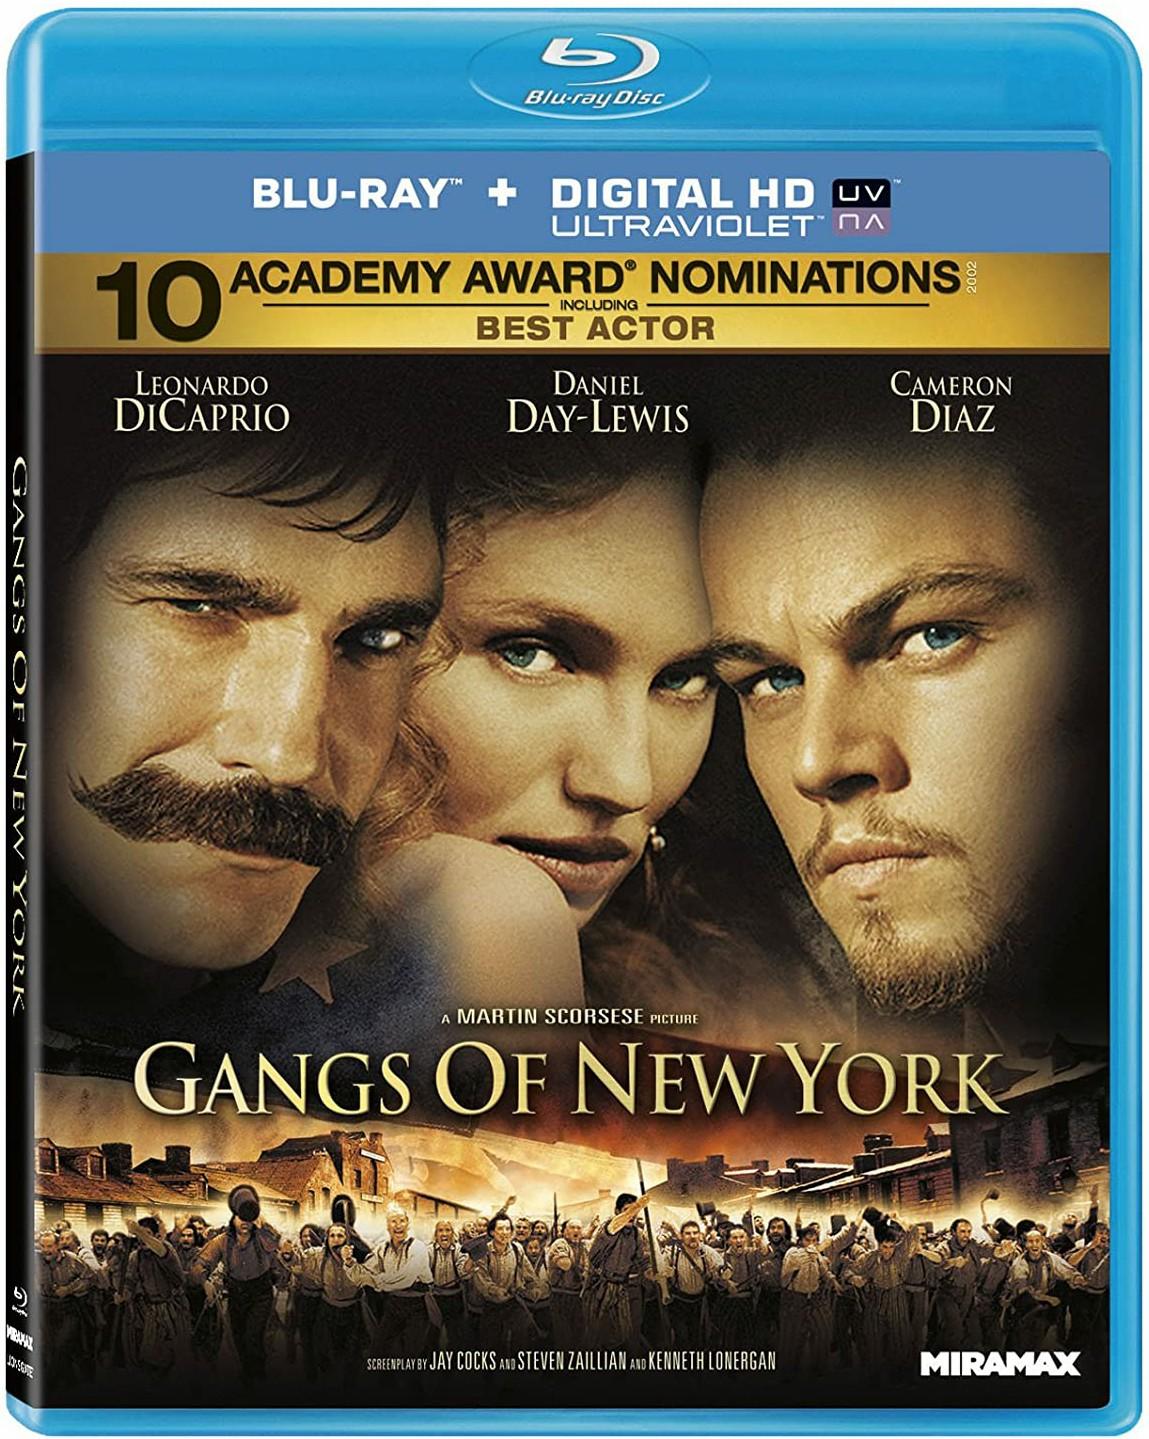 Gangs of New York 2002 Hindi Dual Audio 720p BluRay ESubs 1.2GB | 600MB Download